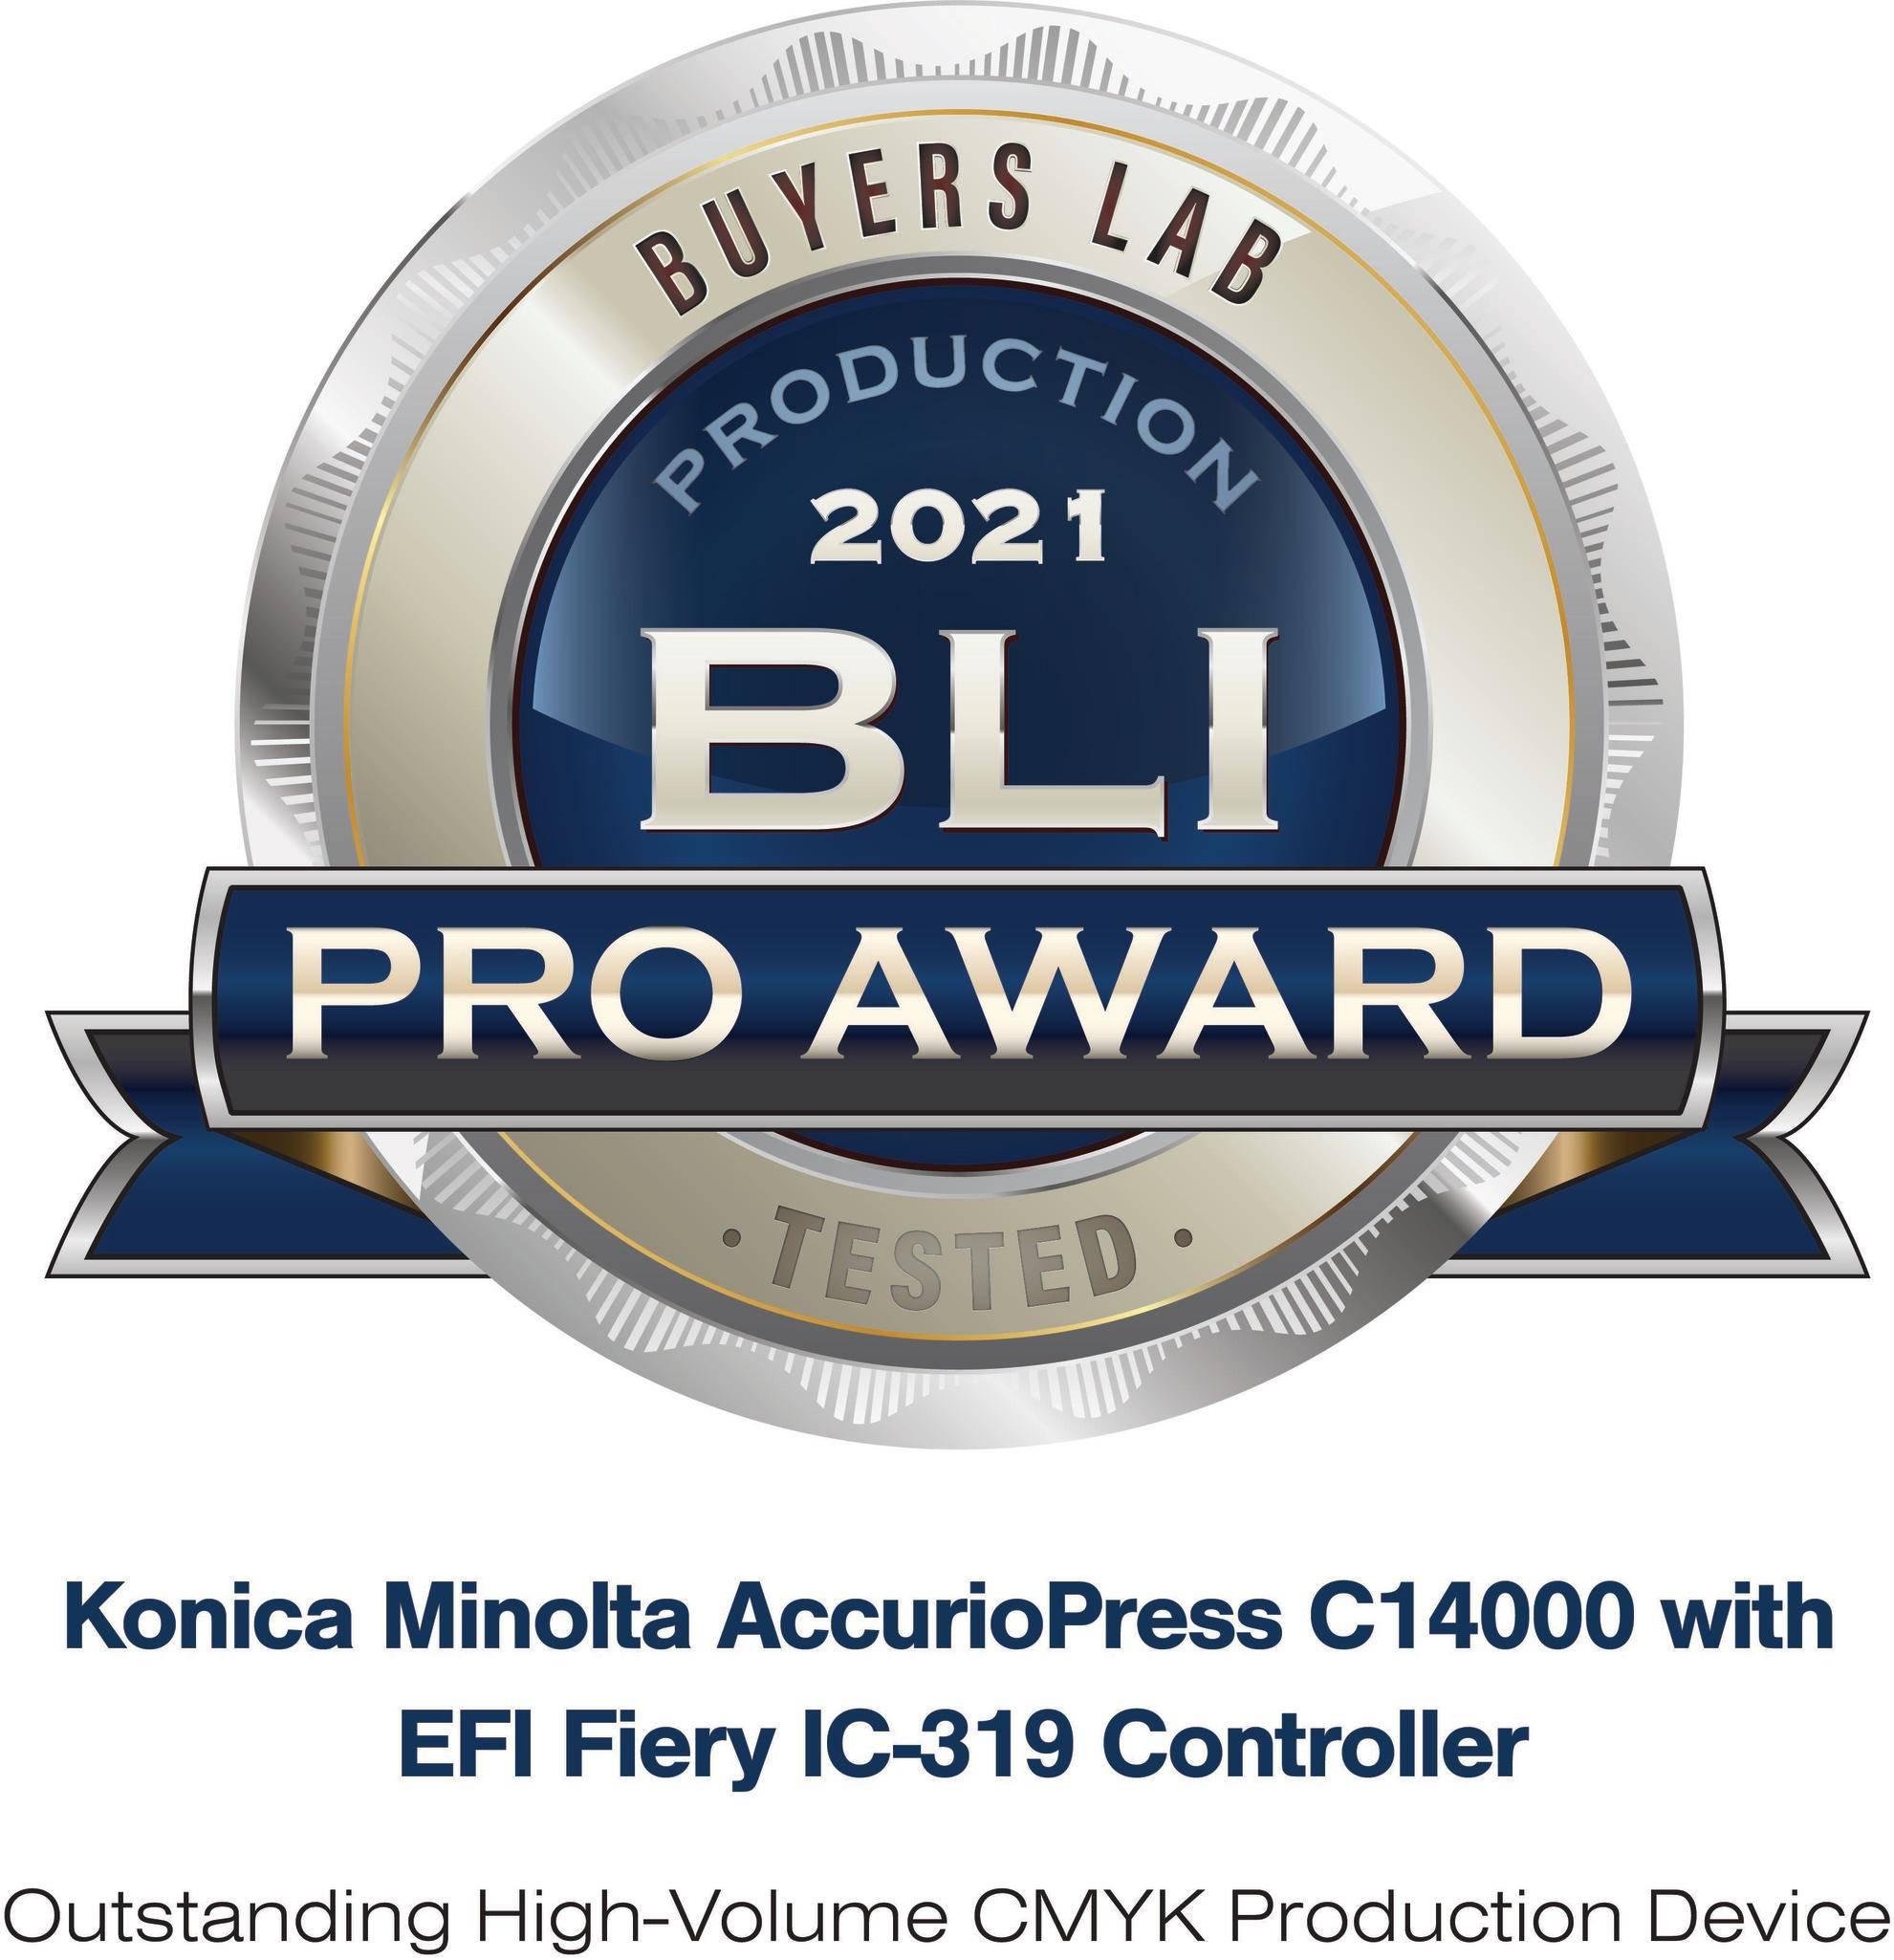 AccurioPress Bli Award 2021 news img2